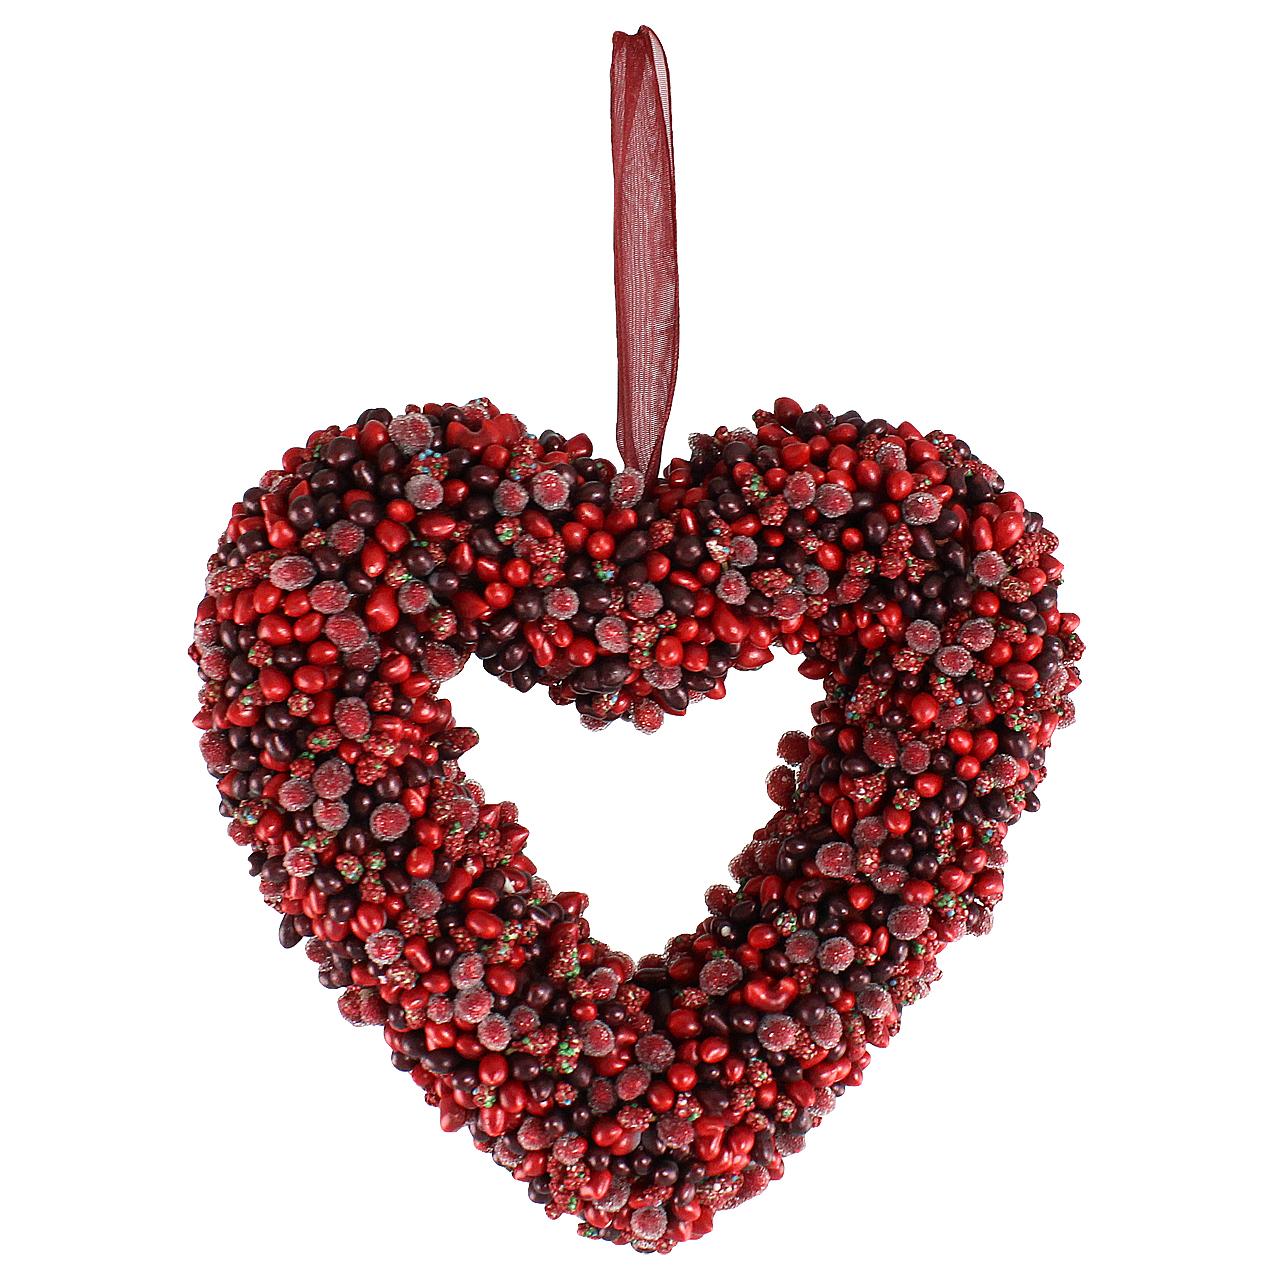 Coronita Decorativa Inima Din Boabe Rosii 17 Cm